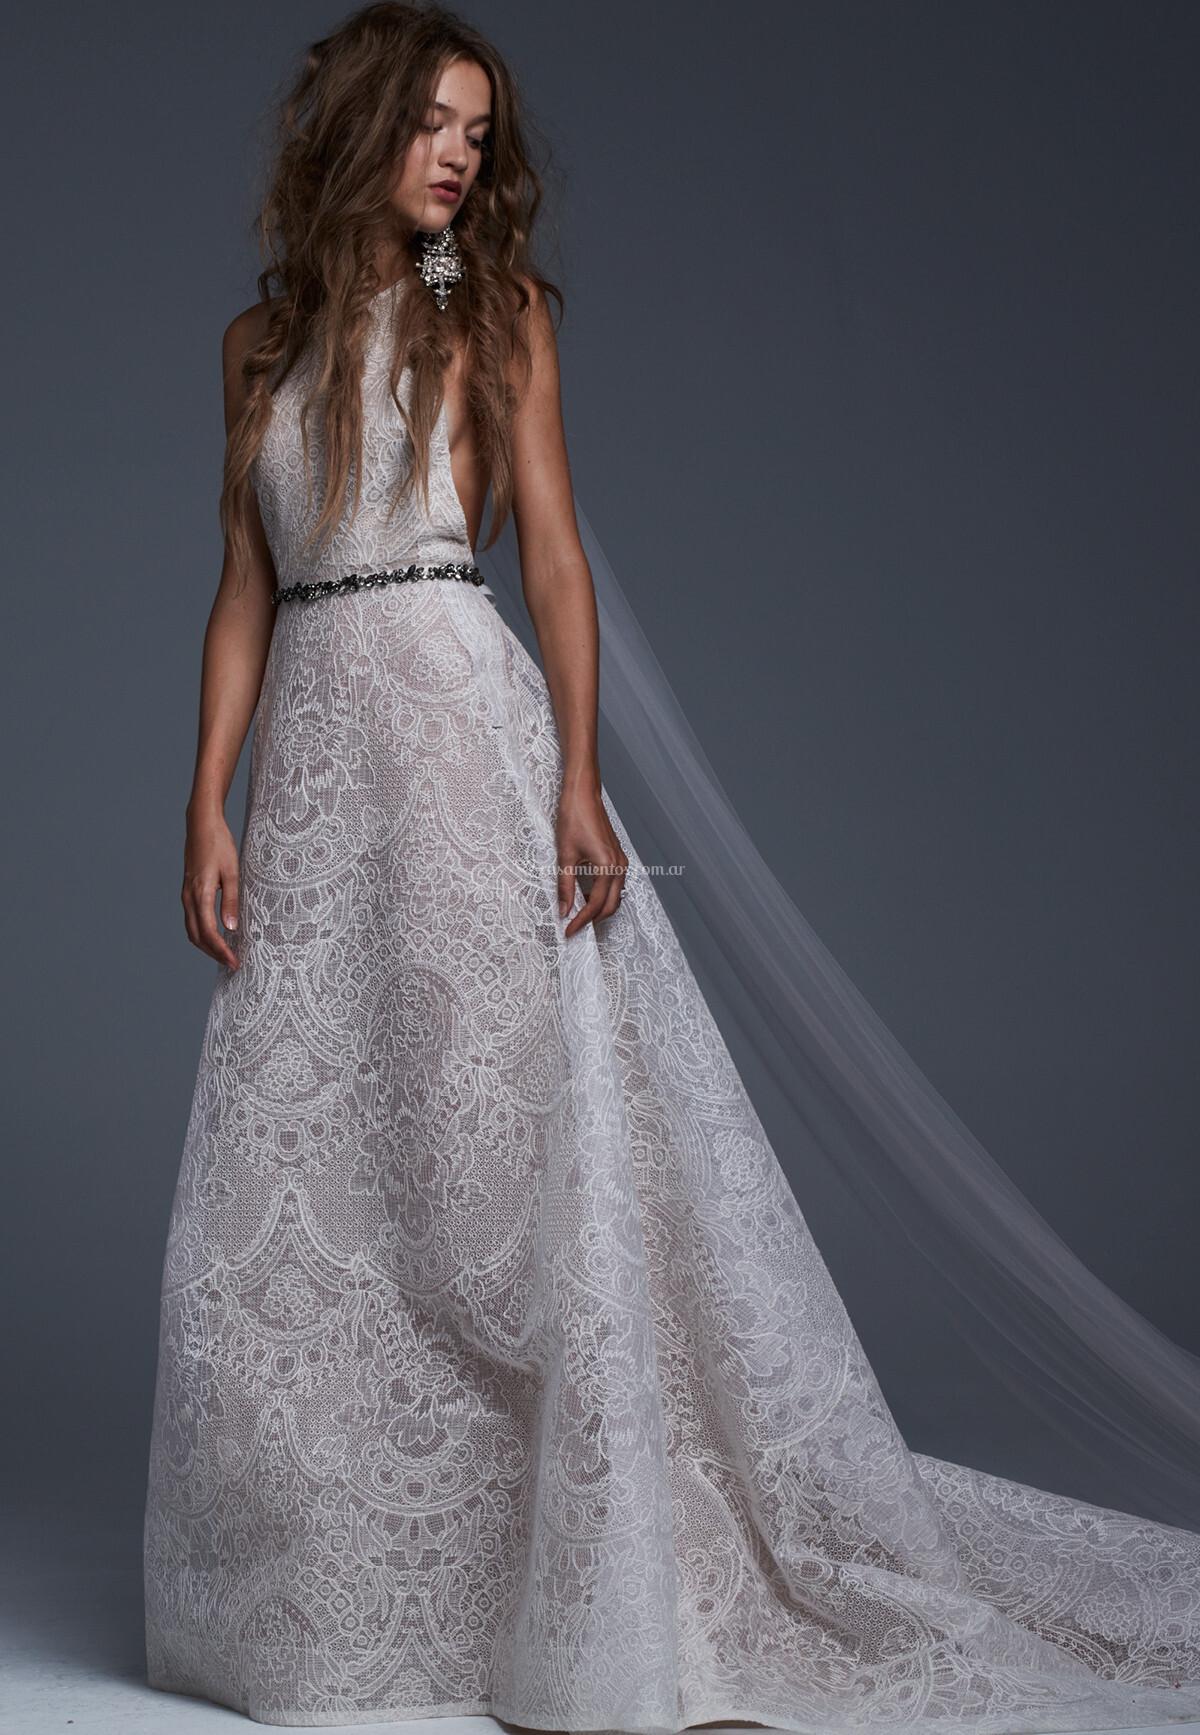 Unique Vera Wang Vestidos De Novia Festooning - Wedding Dress Ideas ...